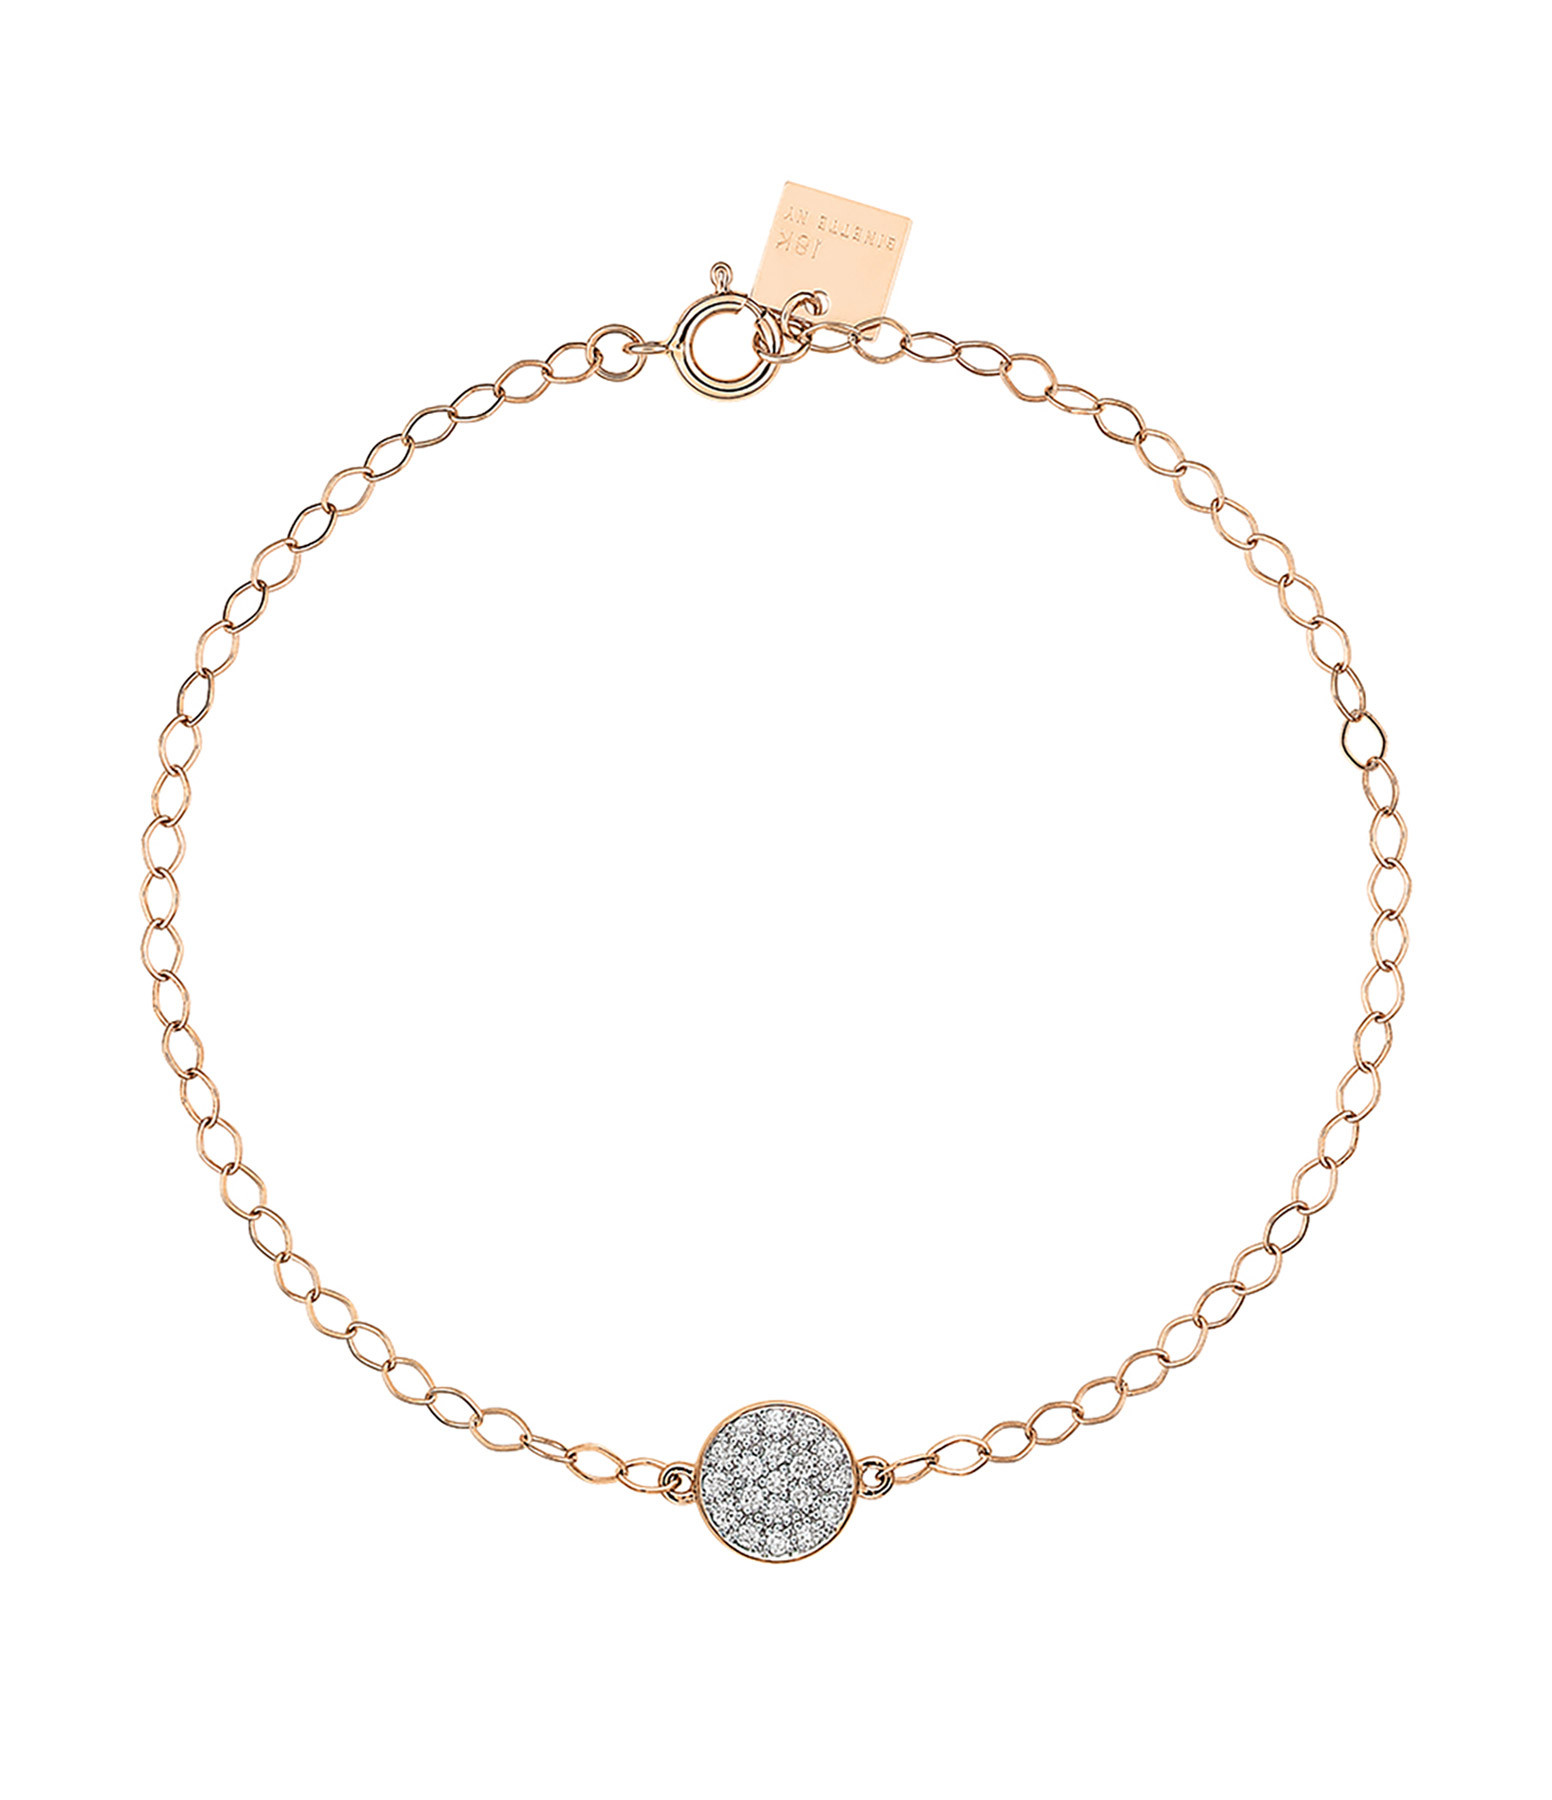 GINETTE_NY,Bracelet Mini Ever Disc Diamants,lulli-sur-la-toile.com